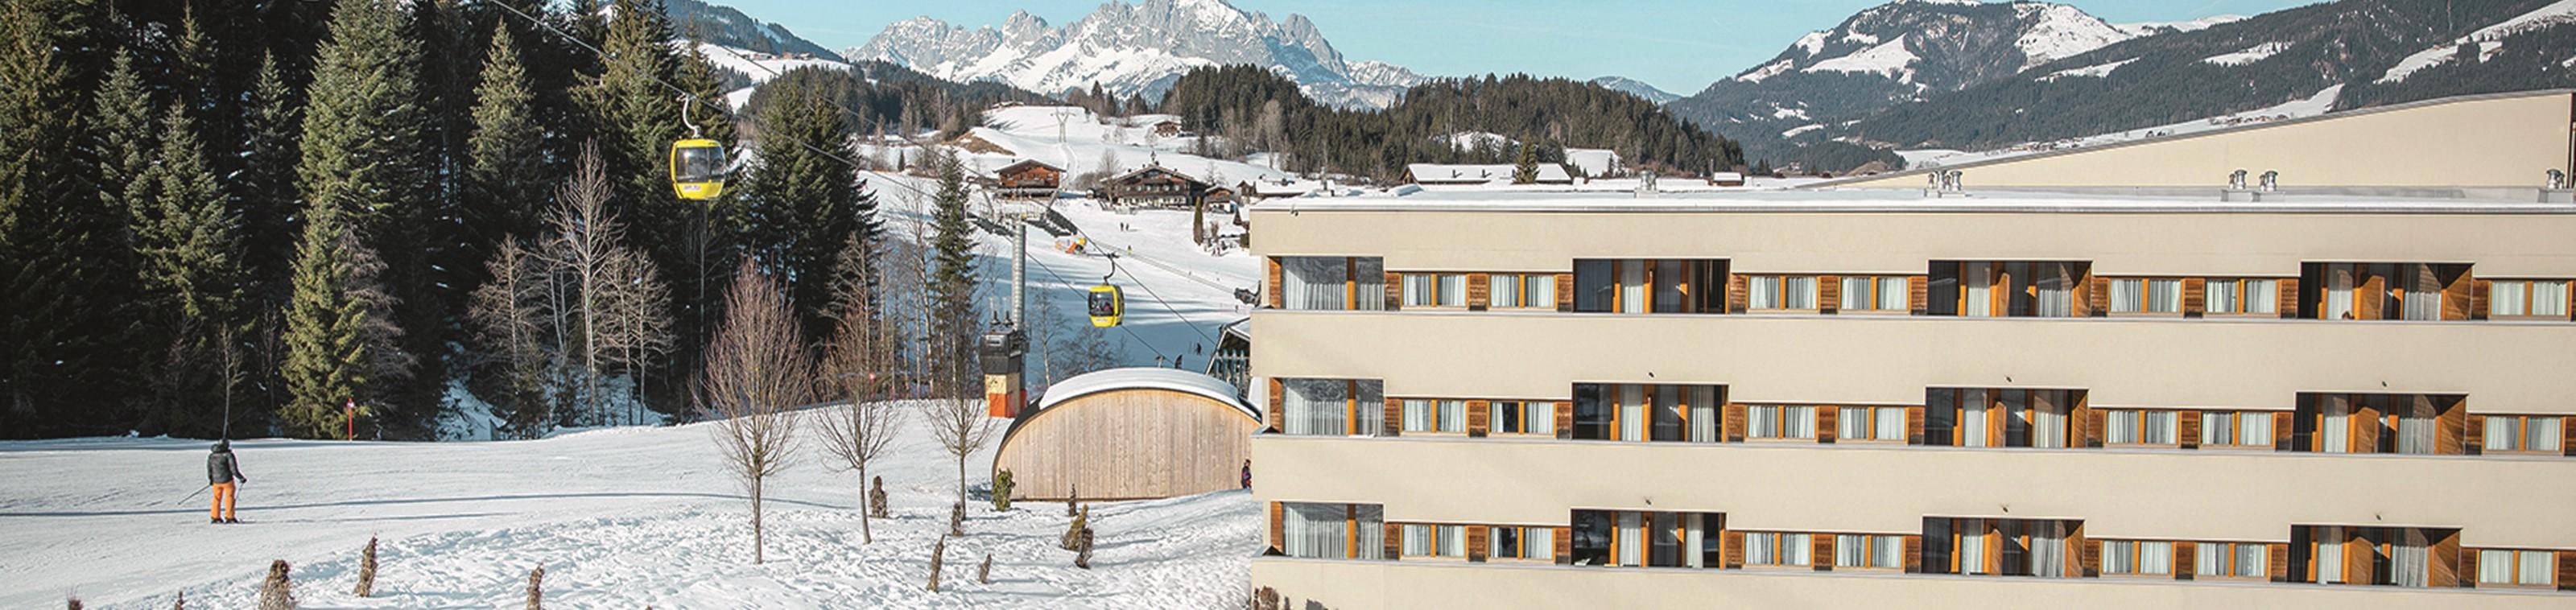 Skiplezier voor het hele gezin in TUI BLUE Fieberbrunn ****